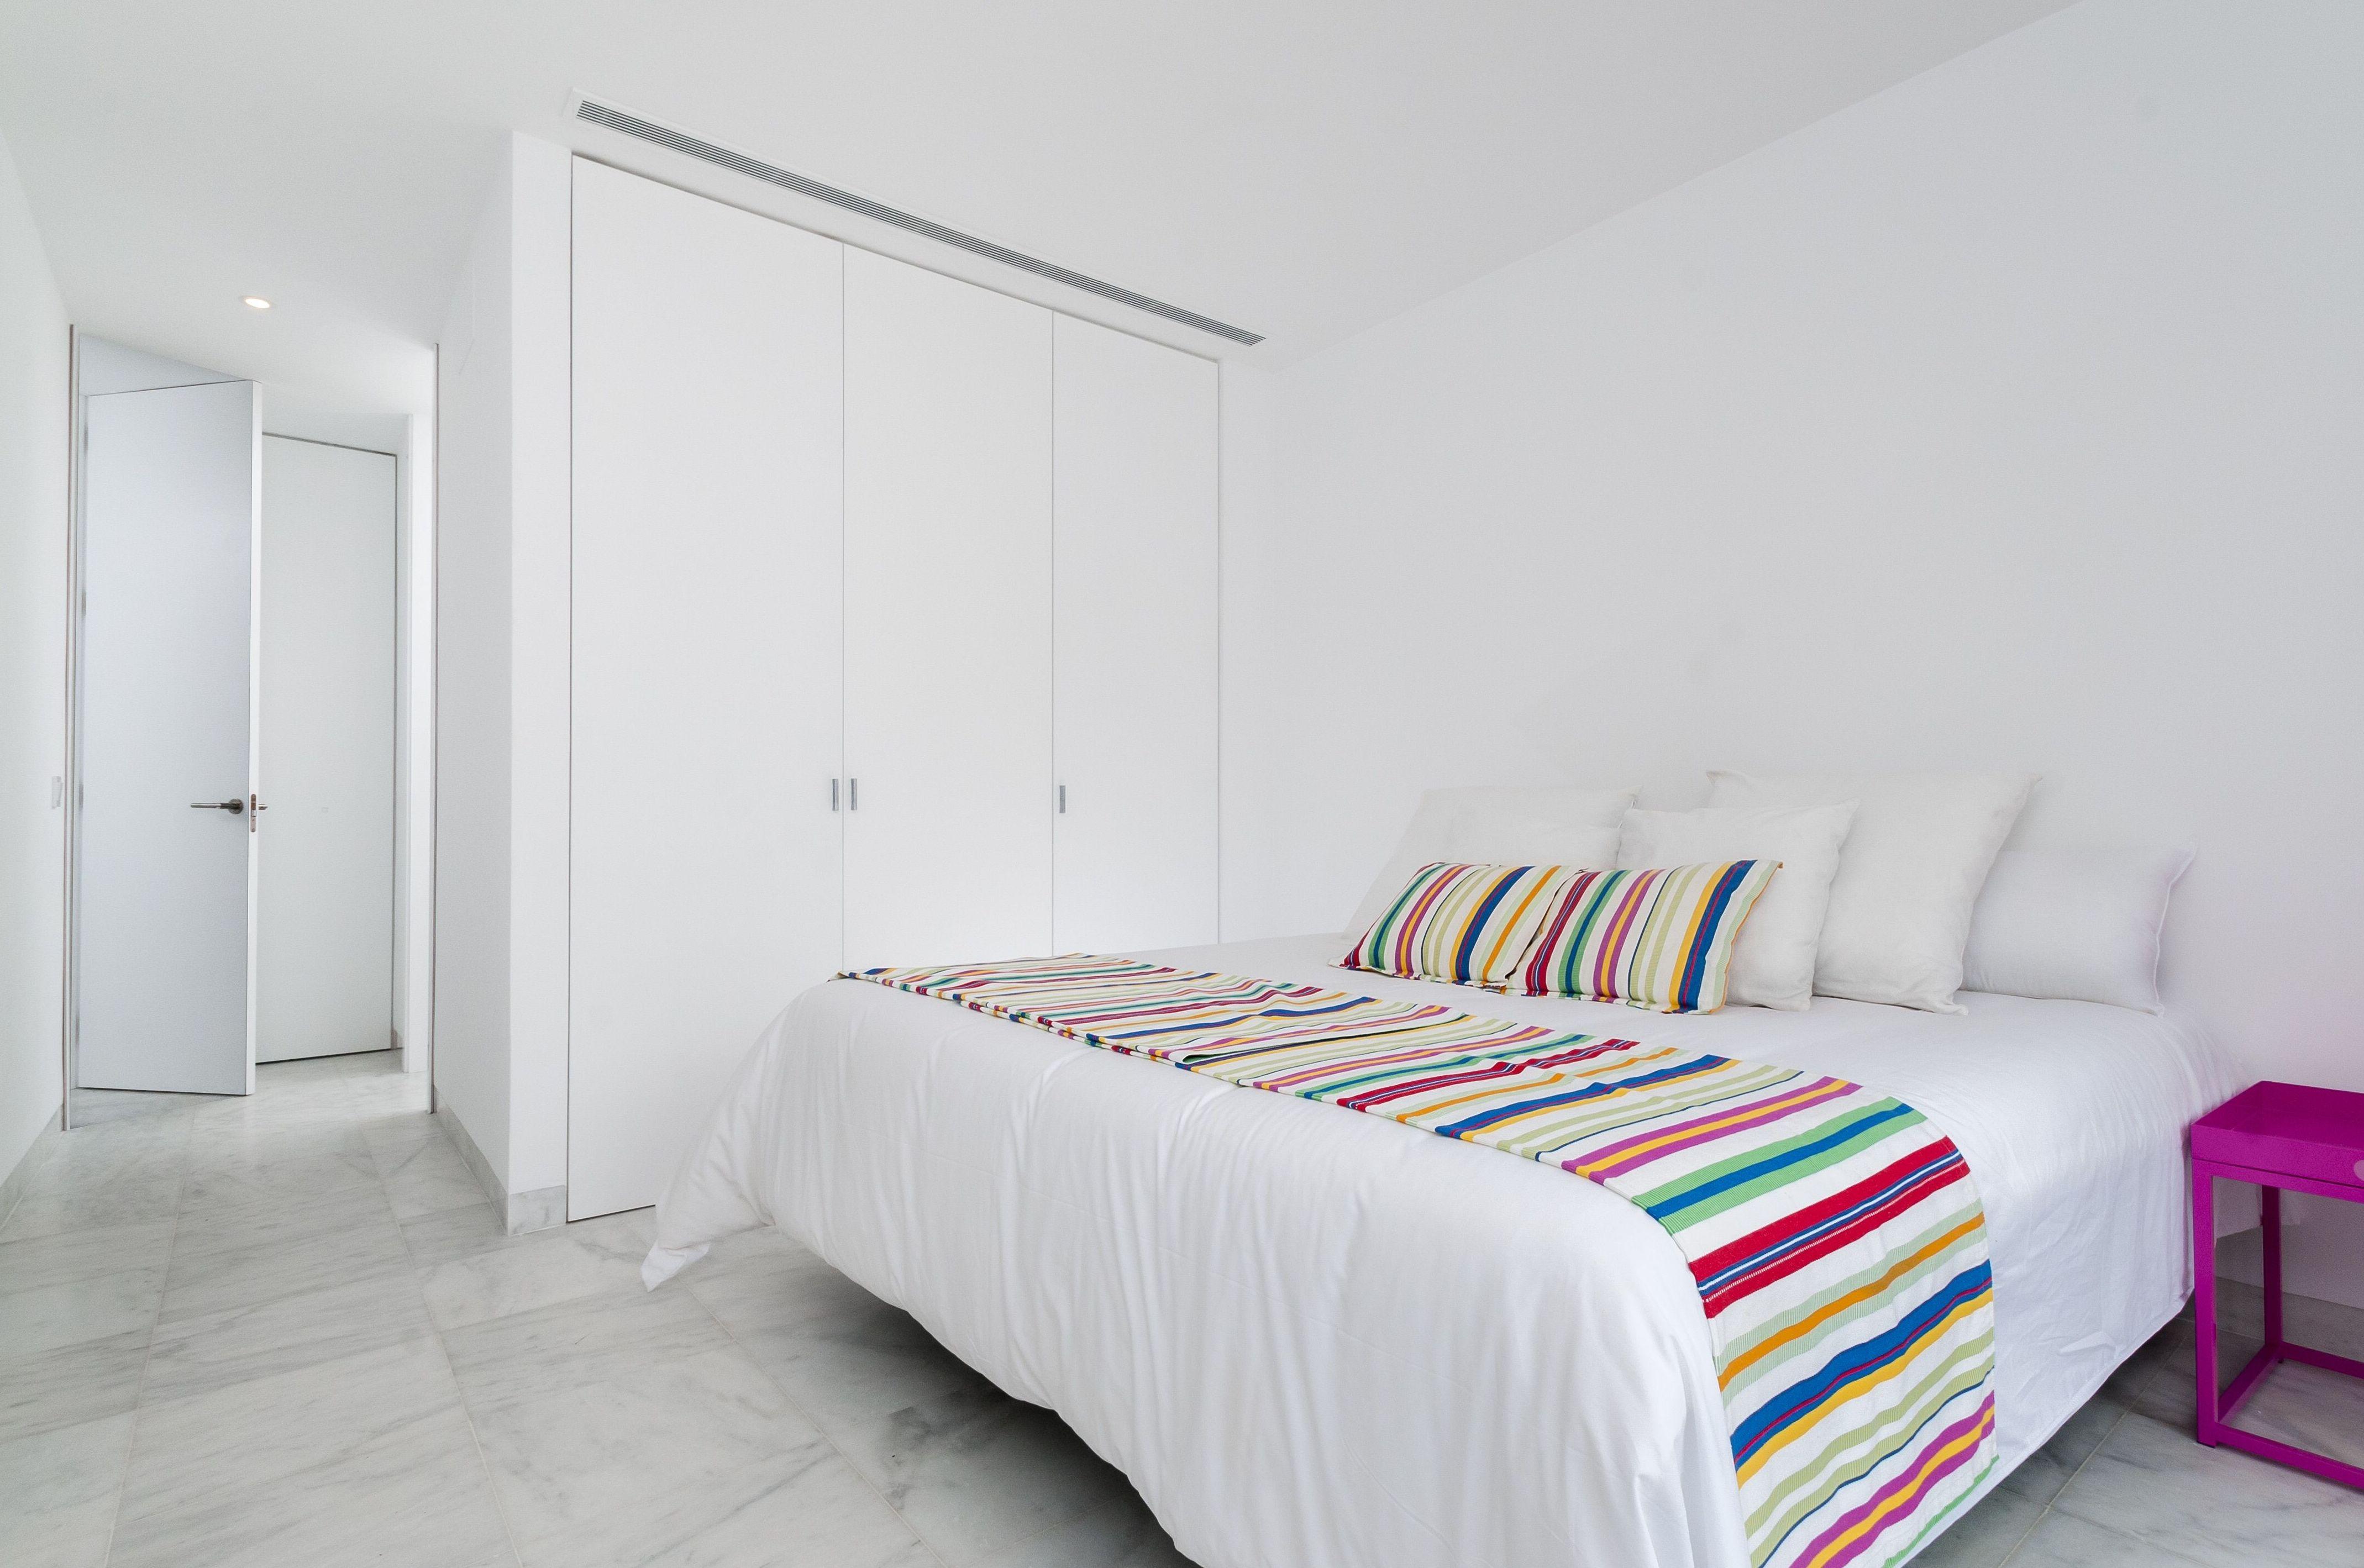 Diseño de arquitectura en Cádiz